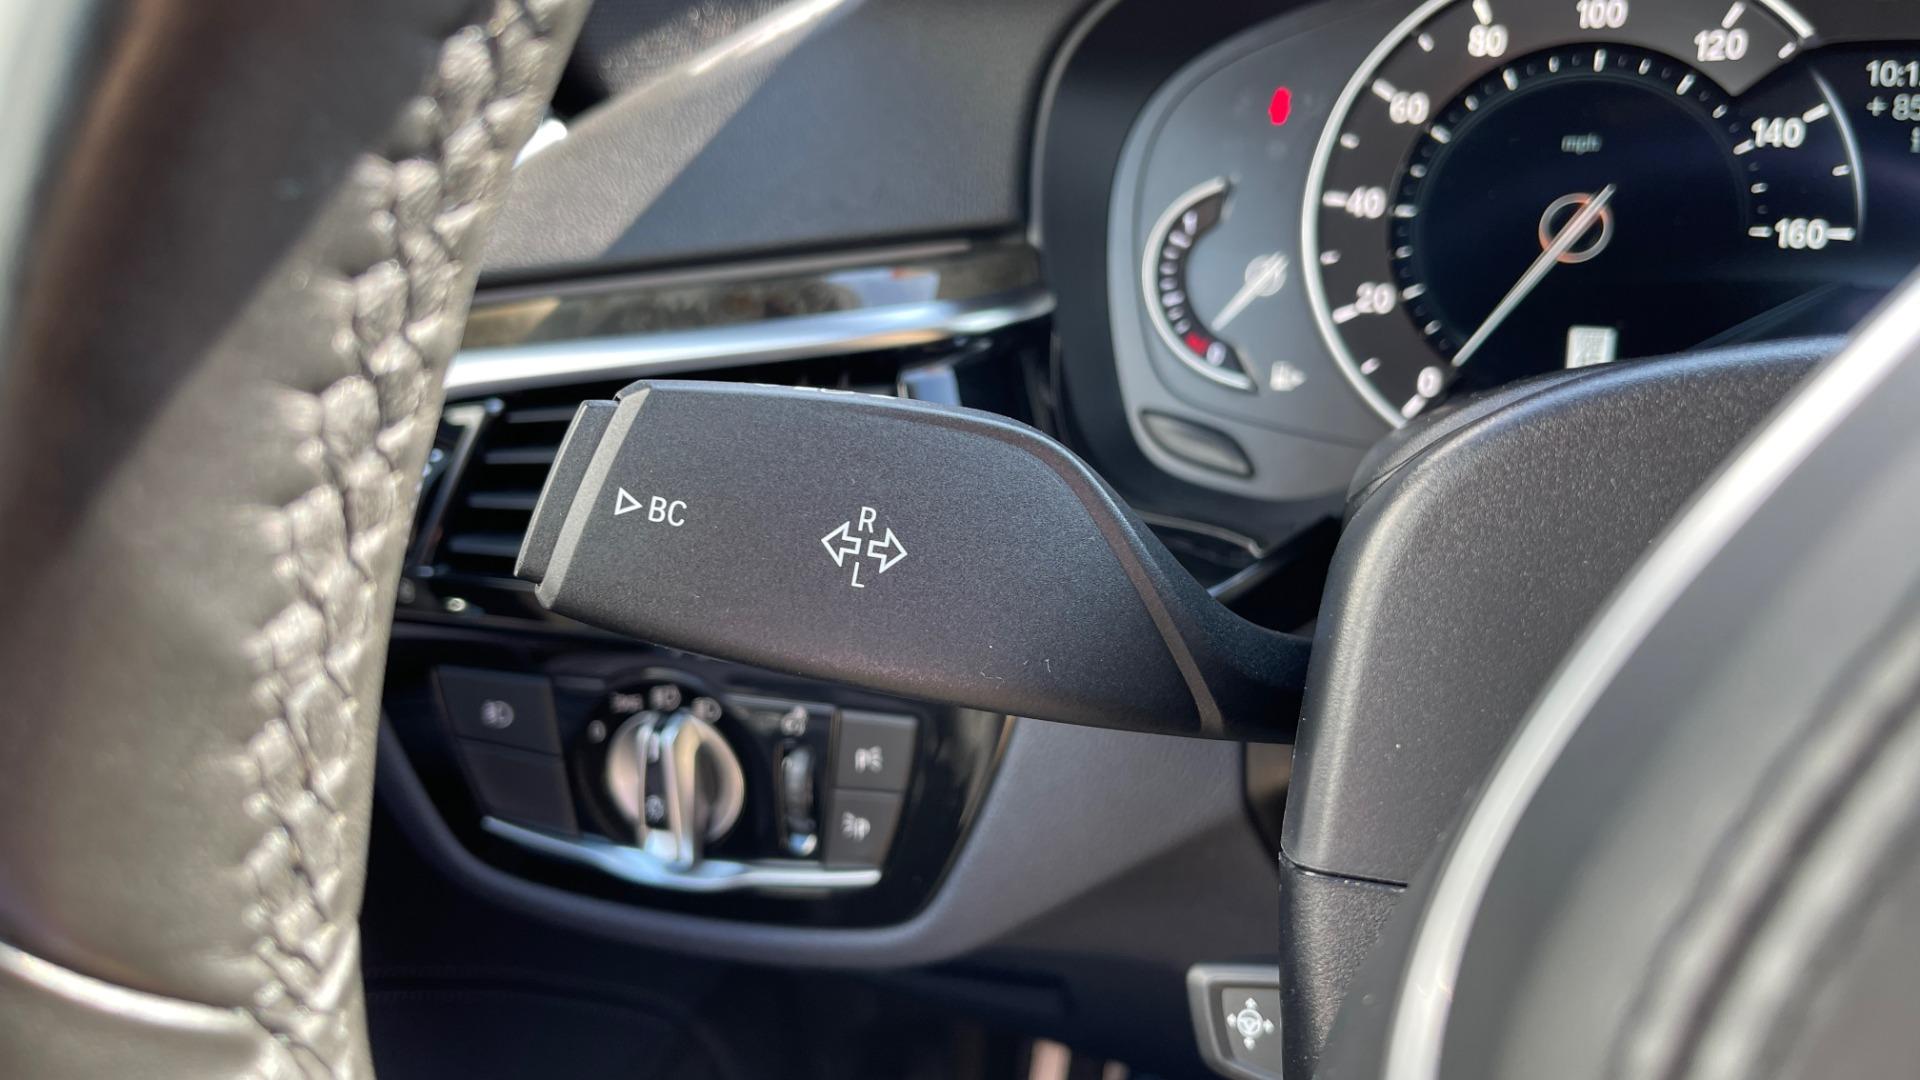 Used 2018 BMW 5 SERIES 540I XDRIVE M-SPORT / DRVR ASST / PDC / APPLE / HUD / H/K SND for sale $42,795 at Formula Imports in Charlotte NC 28227 39